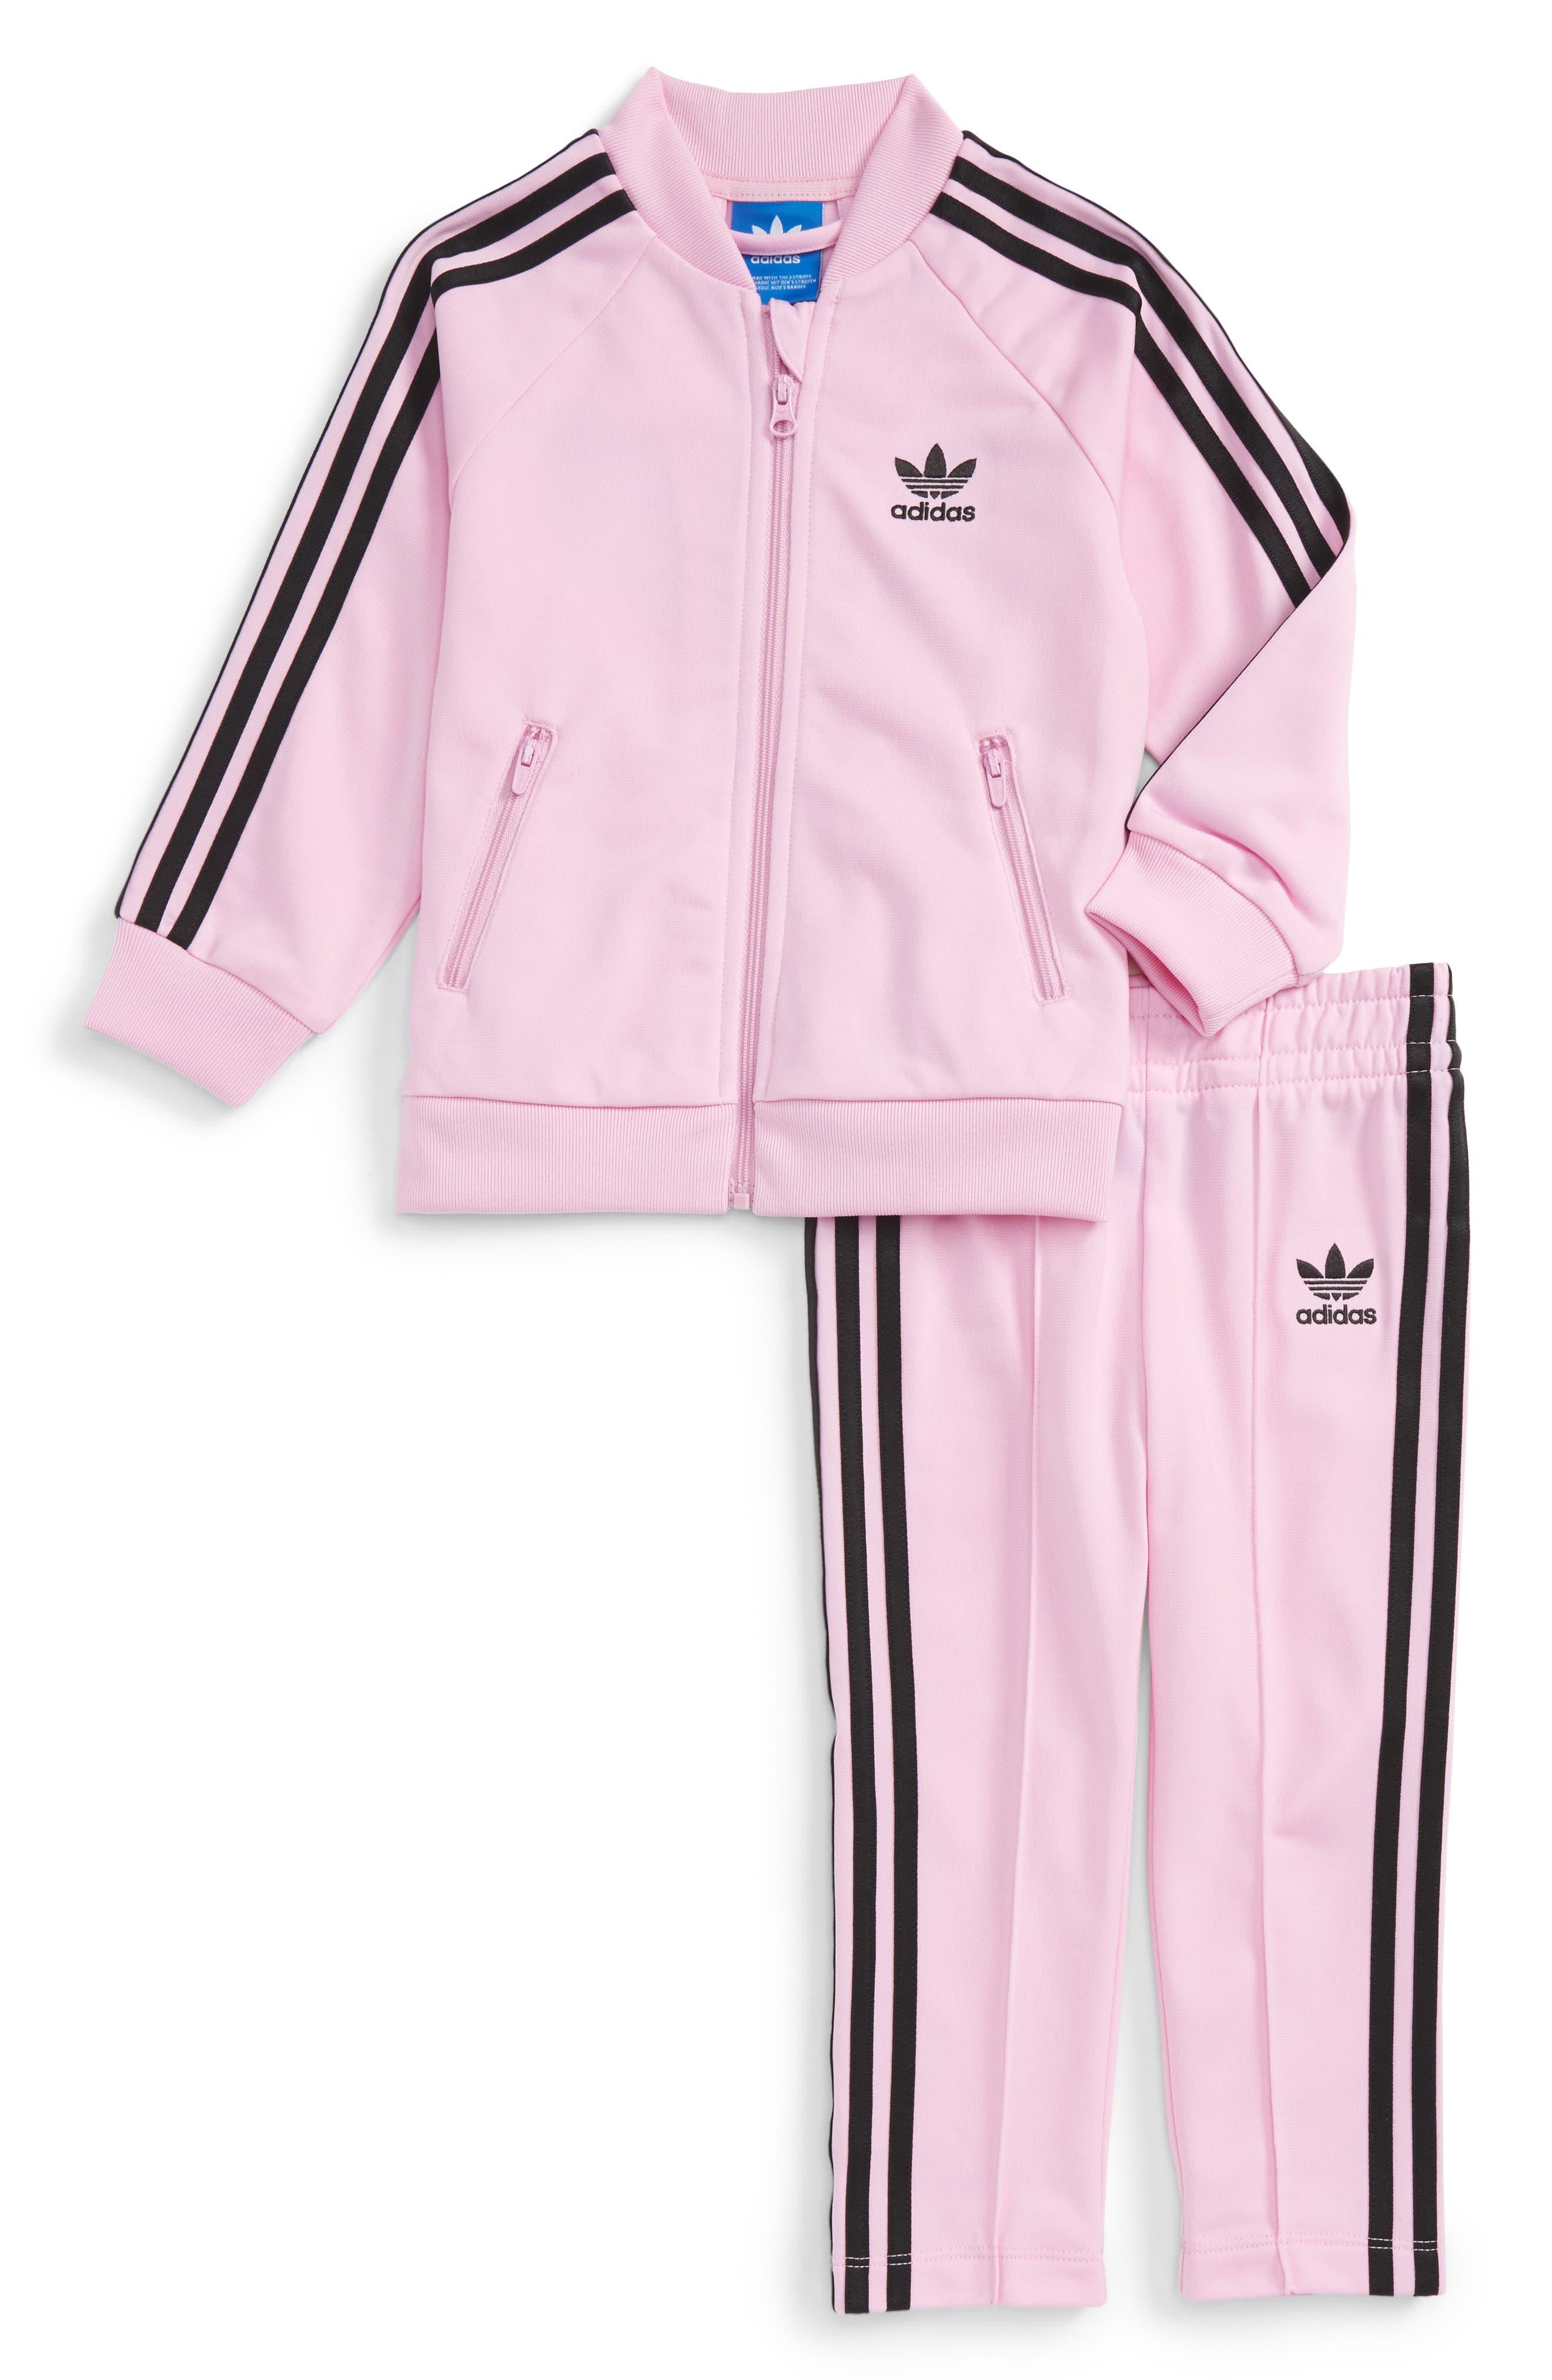 Main Image - adidas Originals Track Jacket & Athletic Pants Set (Baby Girls)